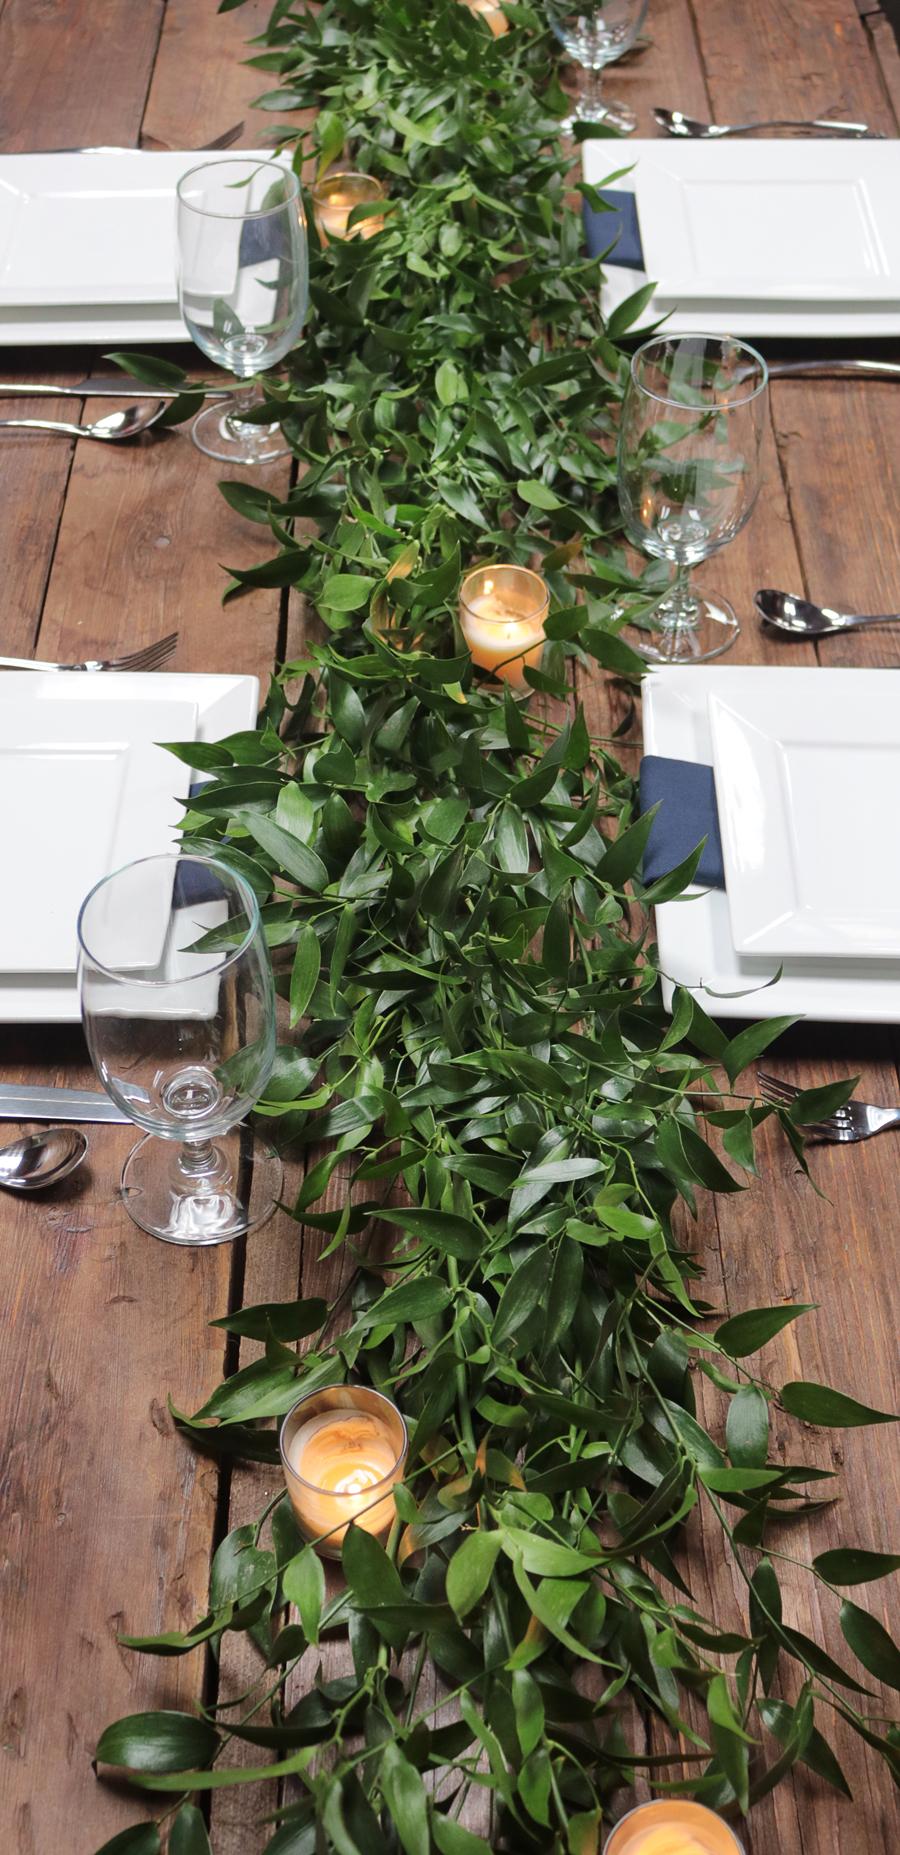 DIY fresh greenery table runner for weddings